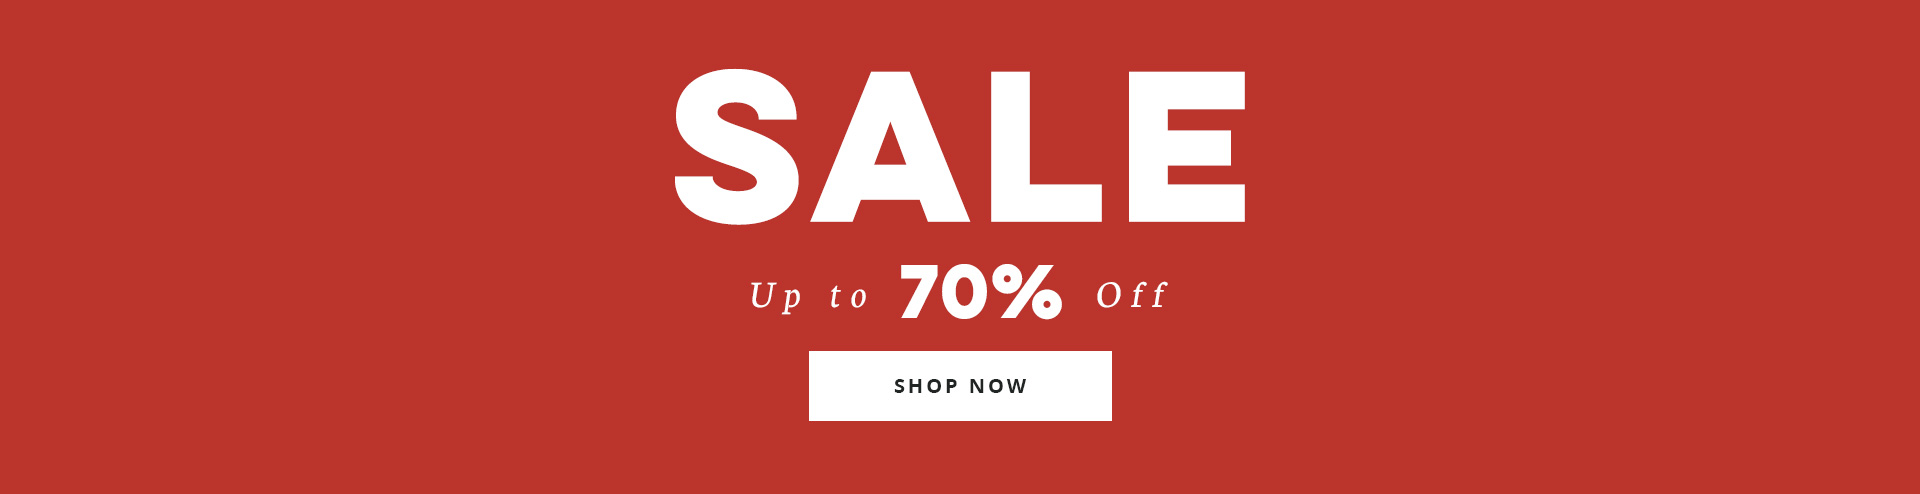 Site wide sale